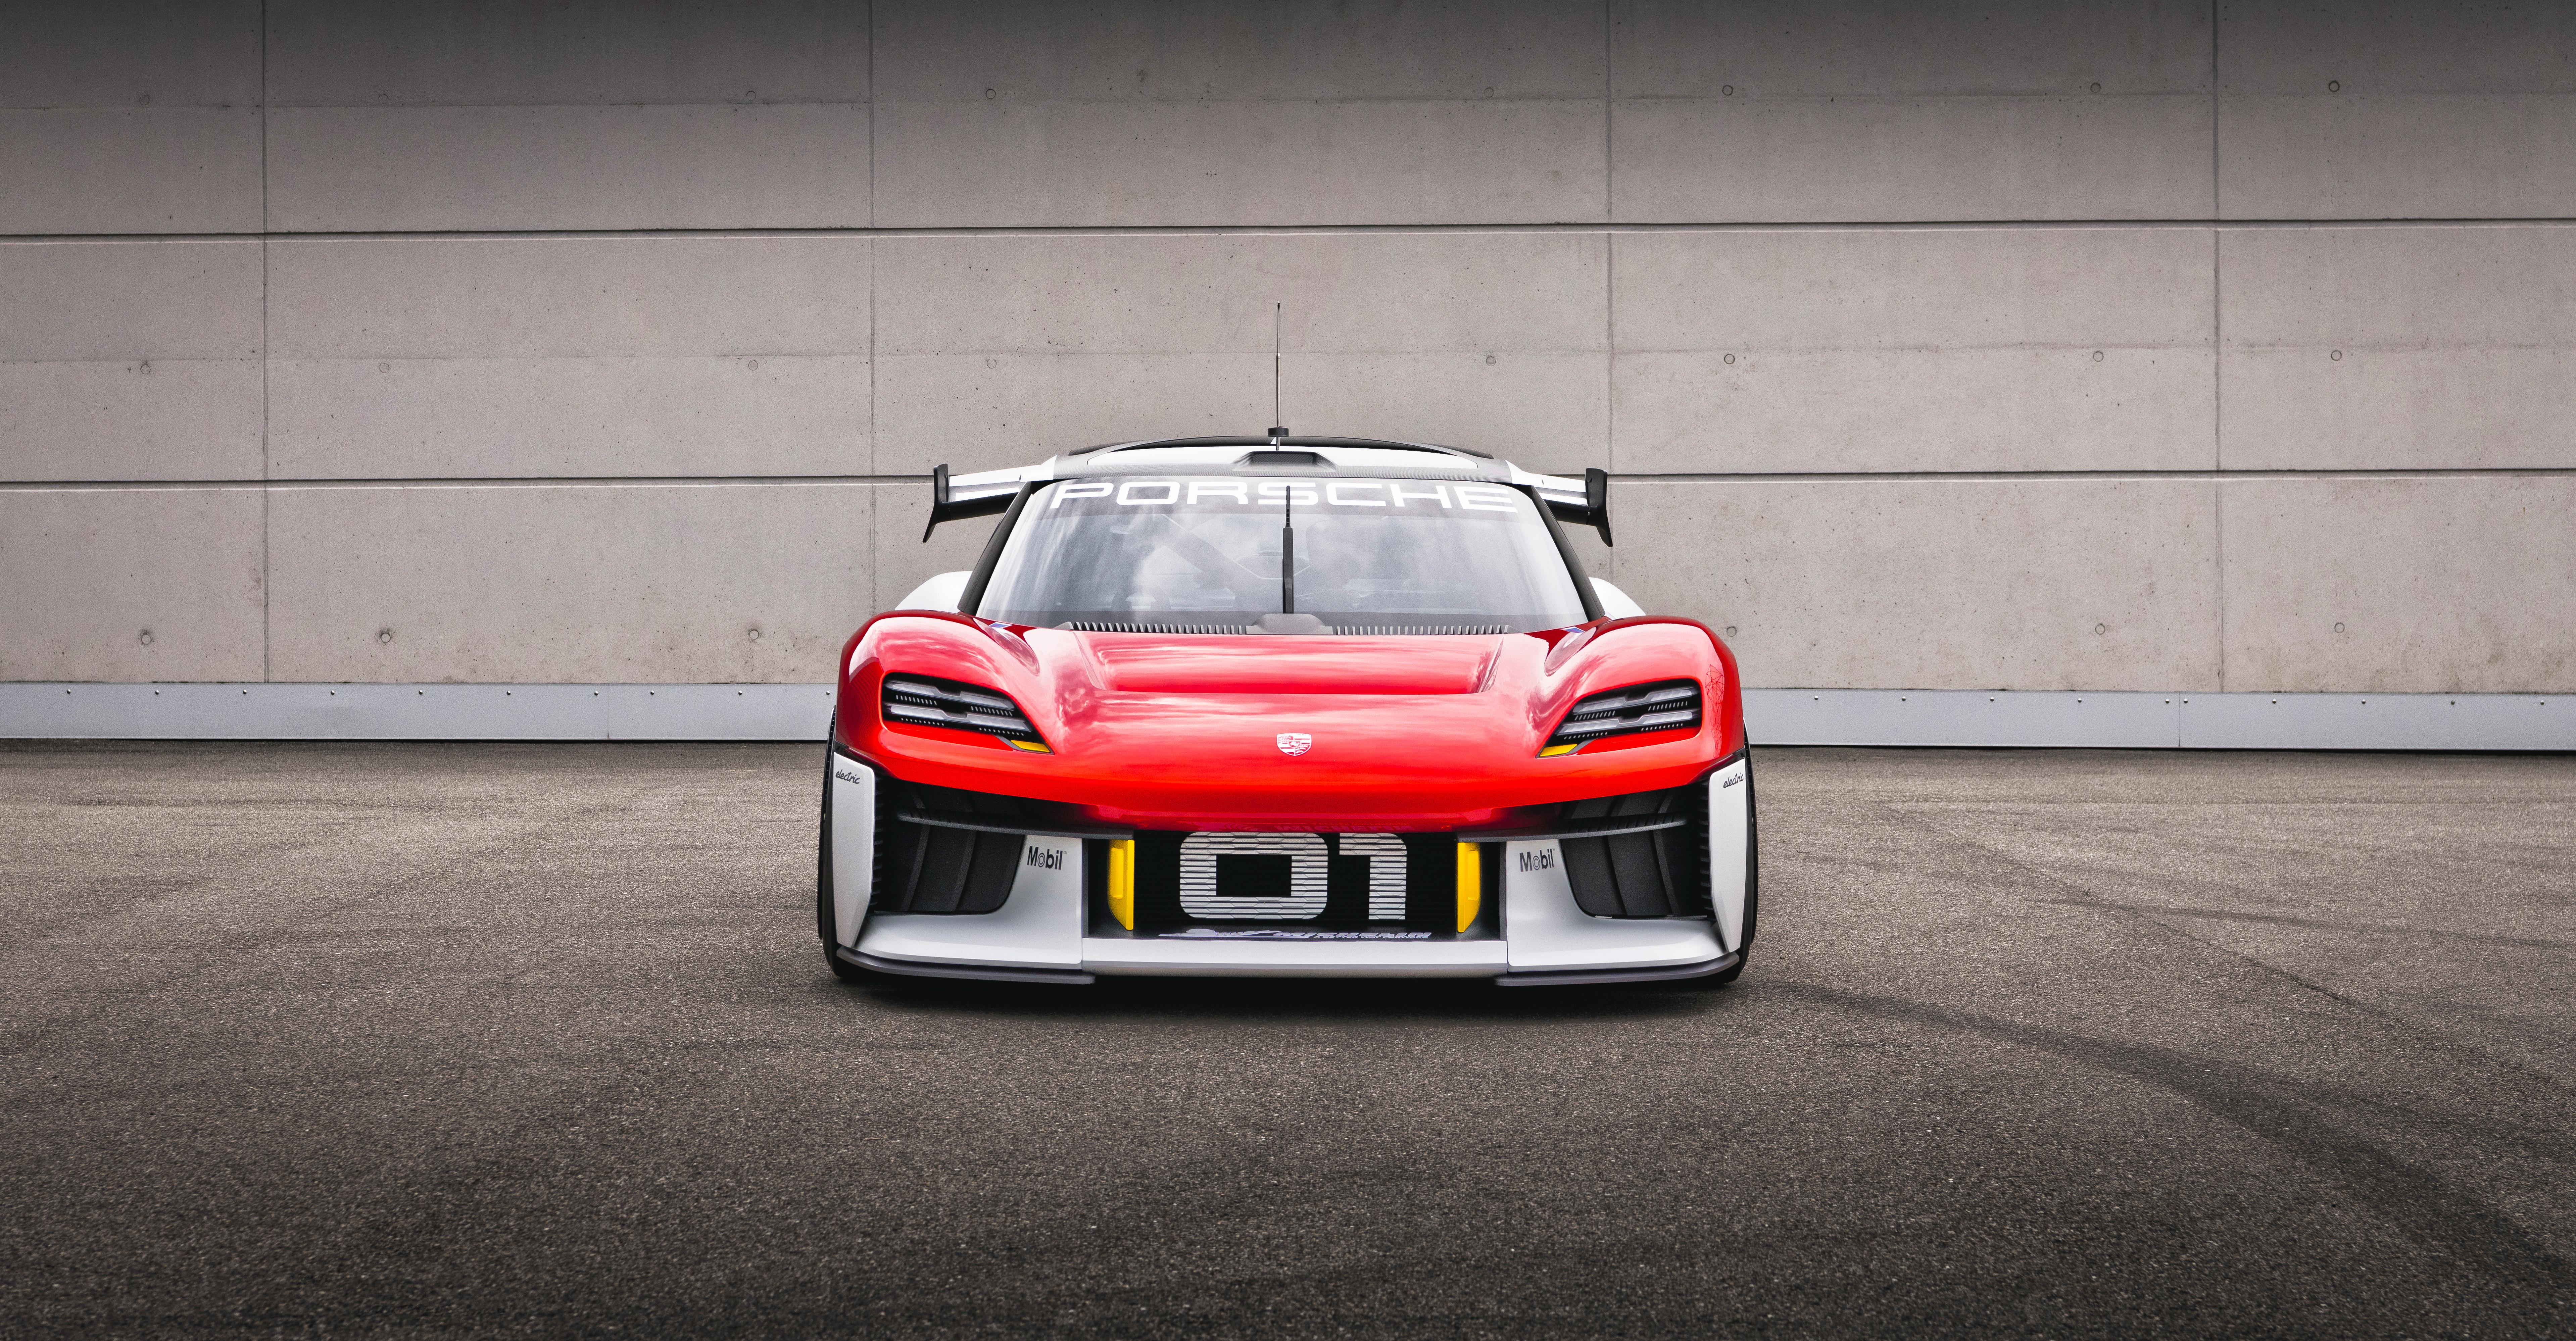 Fondos de pantalla Porsche Mission R